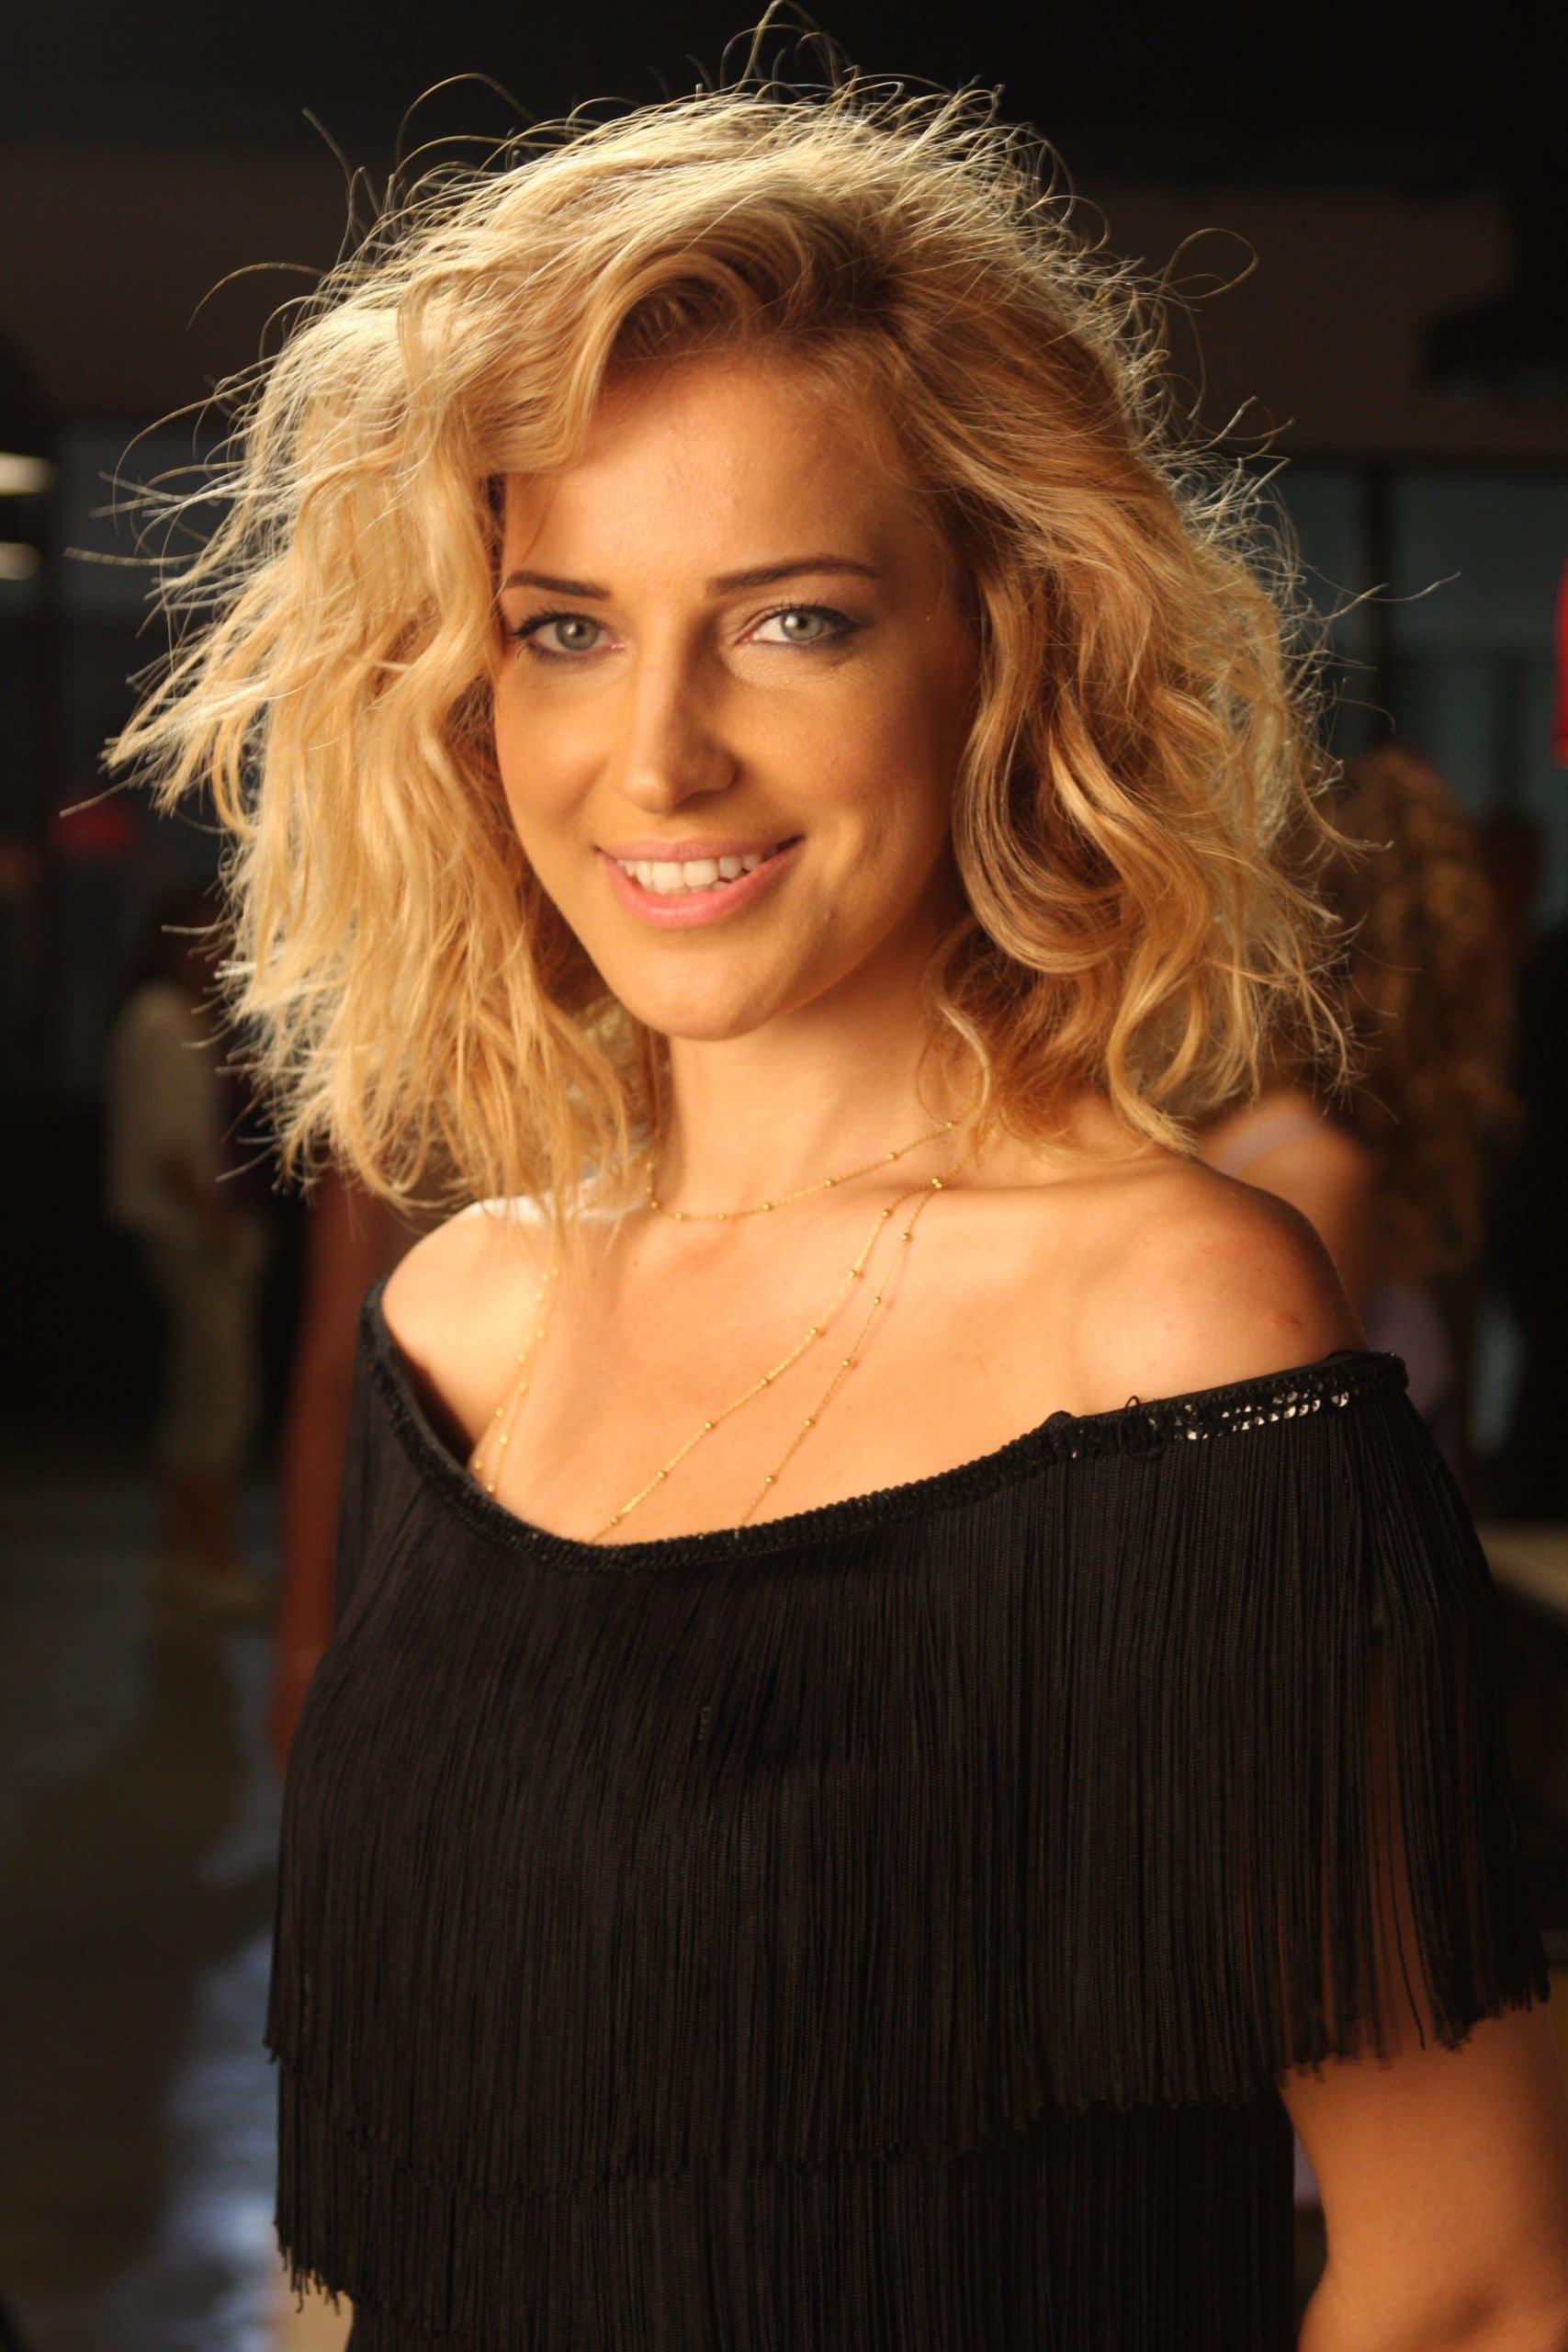 Burcu Esmersoy Turkish Anchor, Journalist, Model, Actress